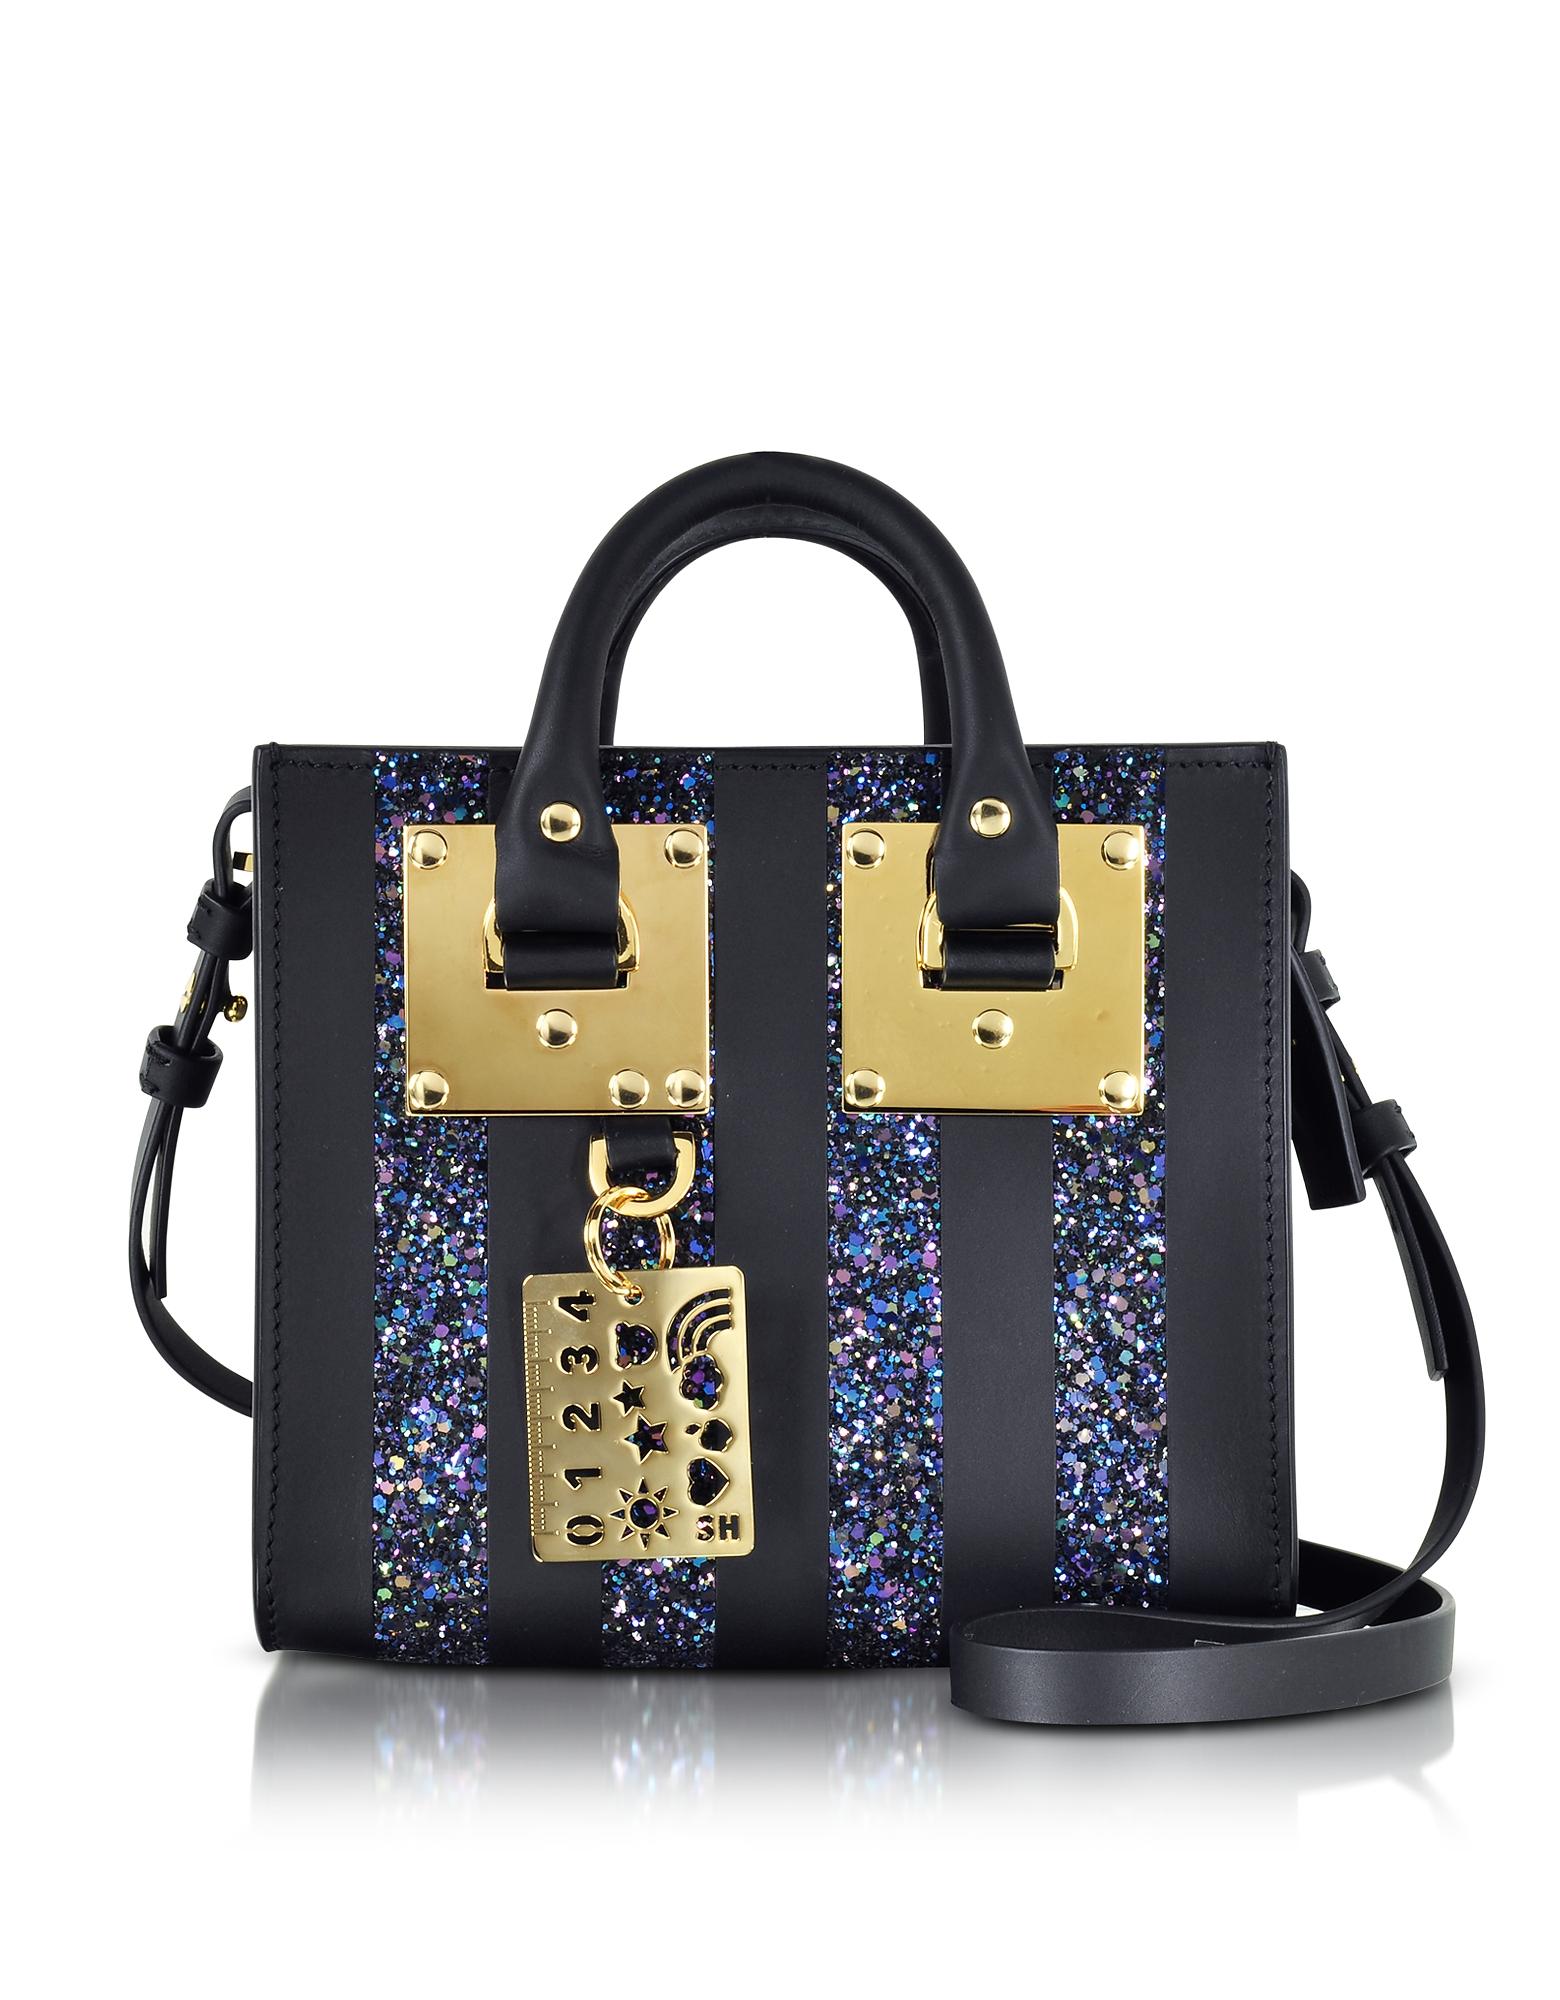 Sophie Hulme Handbags, Black Saddle Leather Albion & Navy Blue Glitter Box Tote Bag